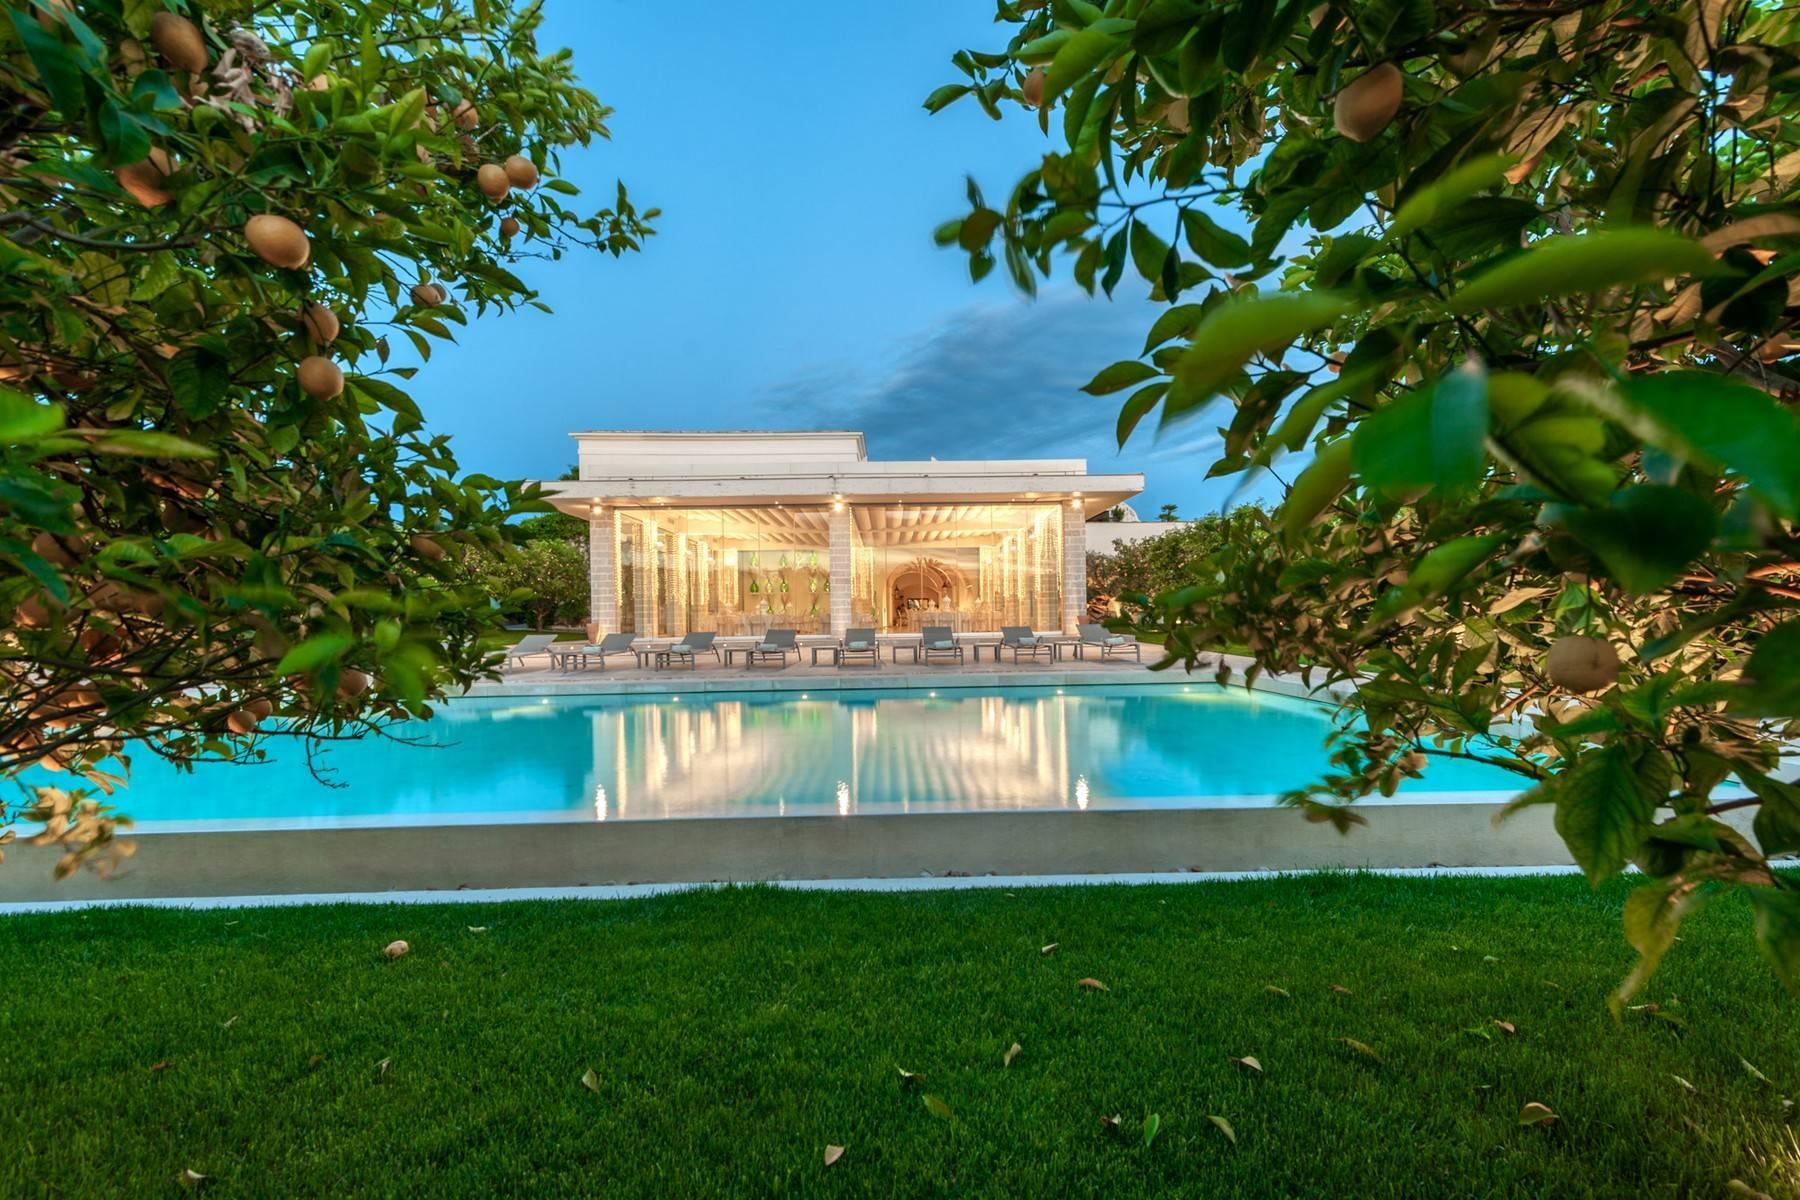 Splendida villa gentilizia del '600 circondata da agrumeti - 19